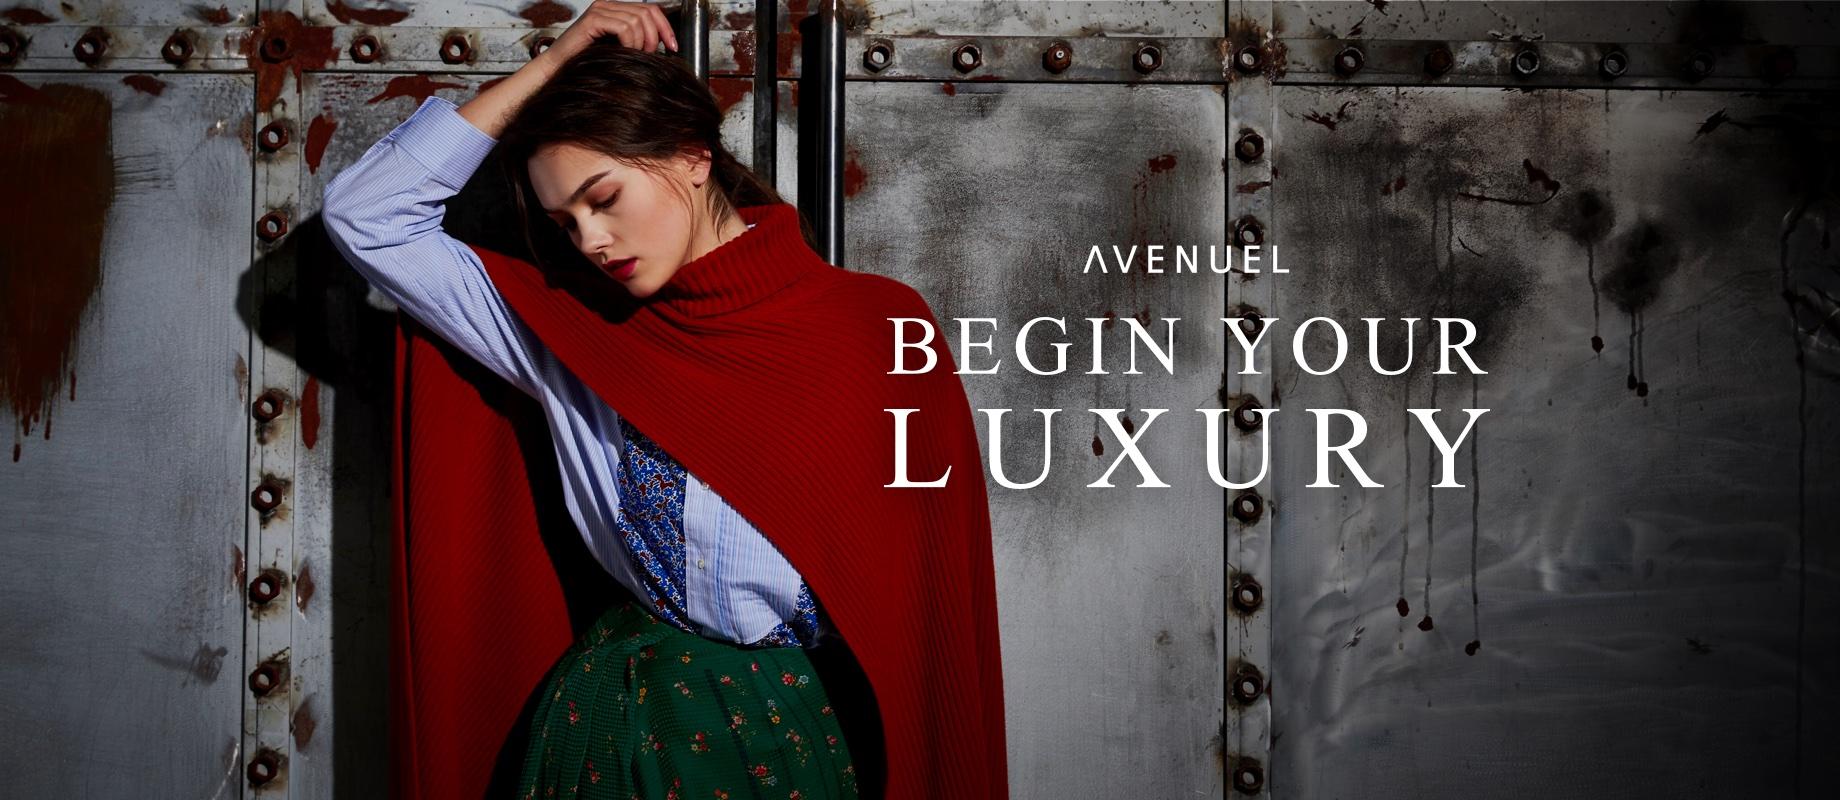 AVENUEL BEGIN YOUR LUXULY